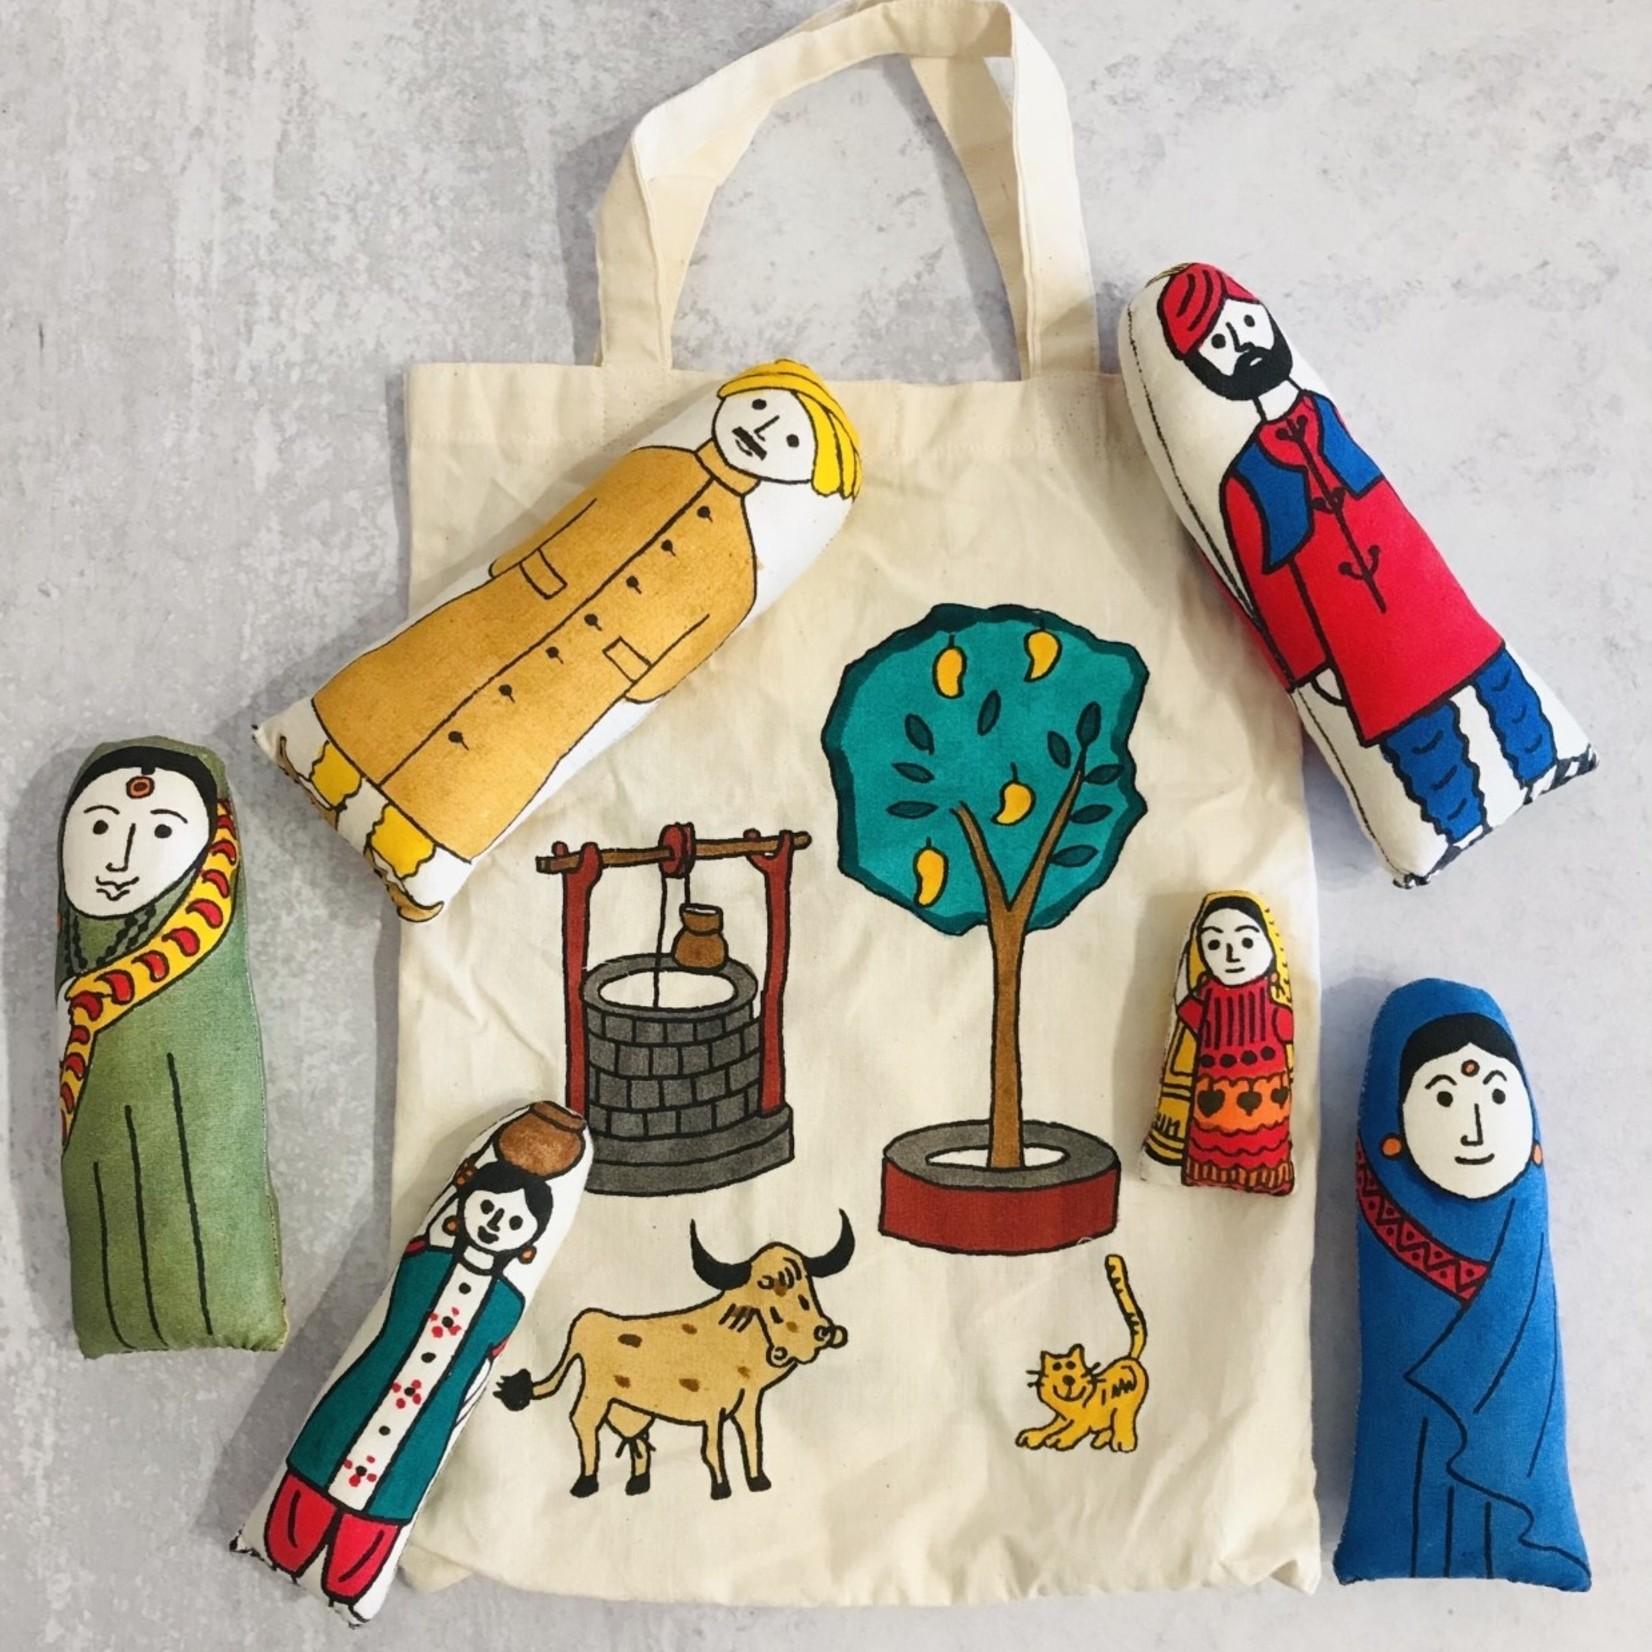 Market Stuffed Toys-Trip To The Village